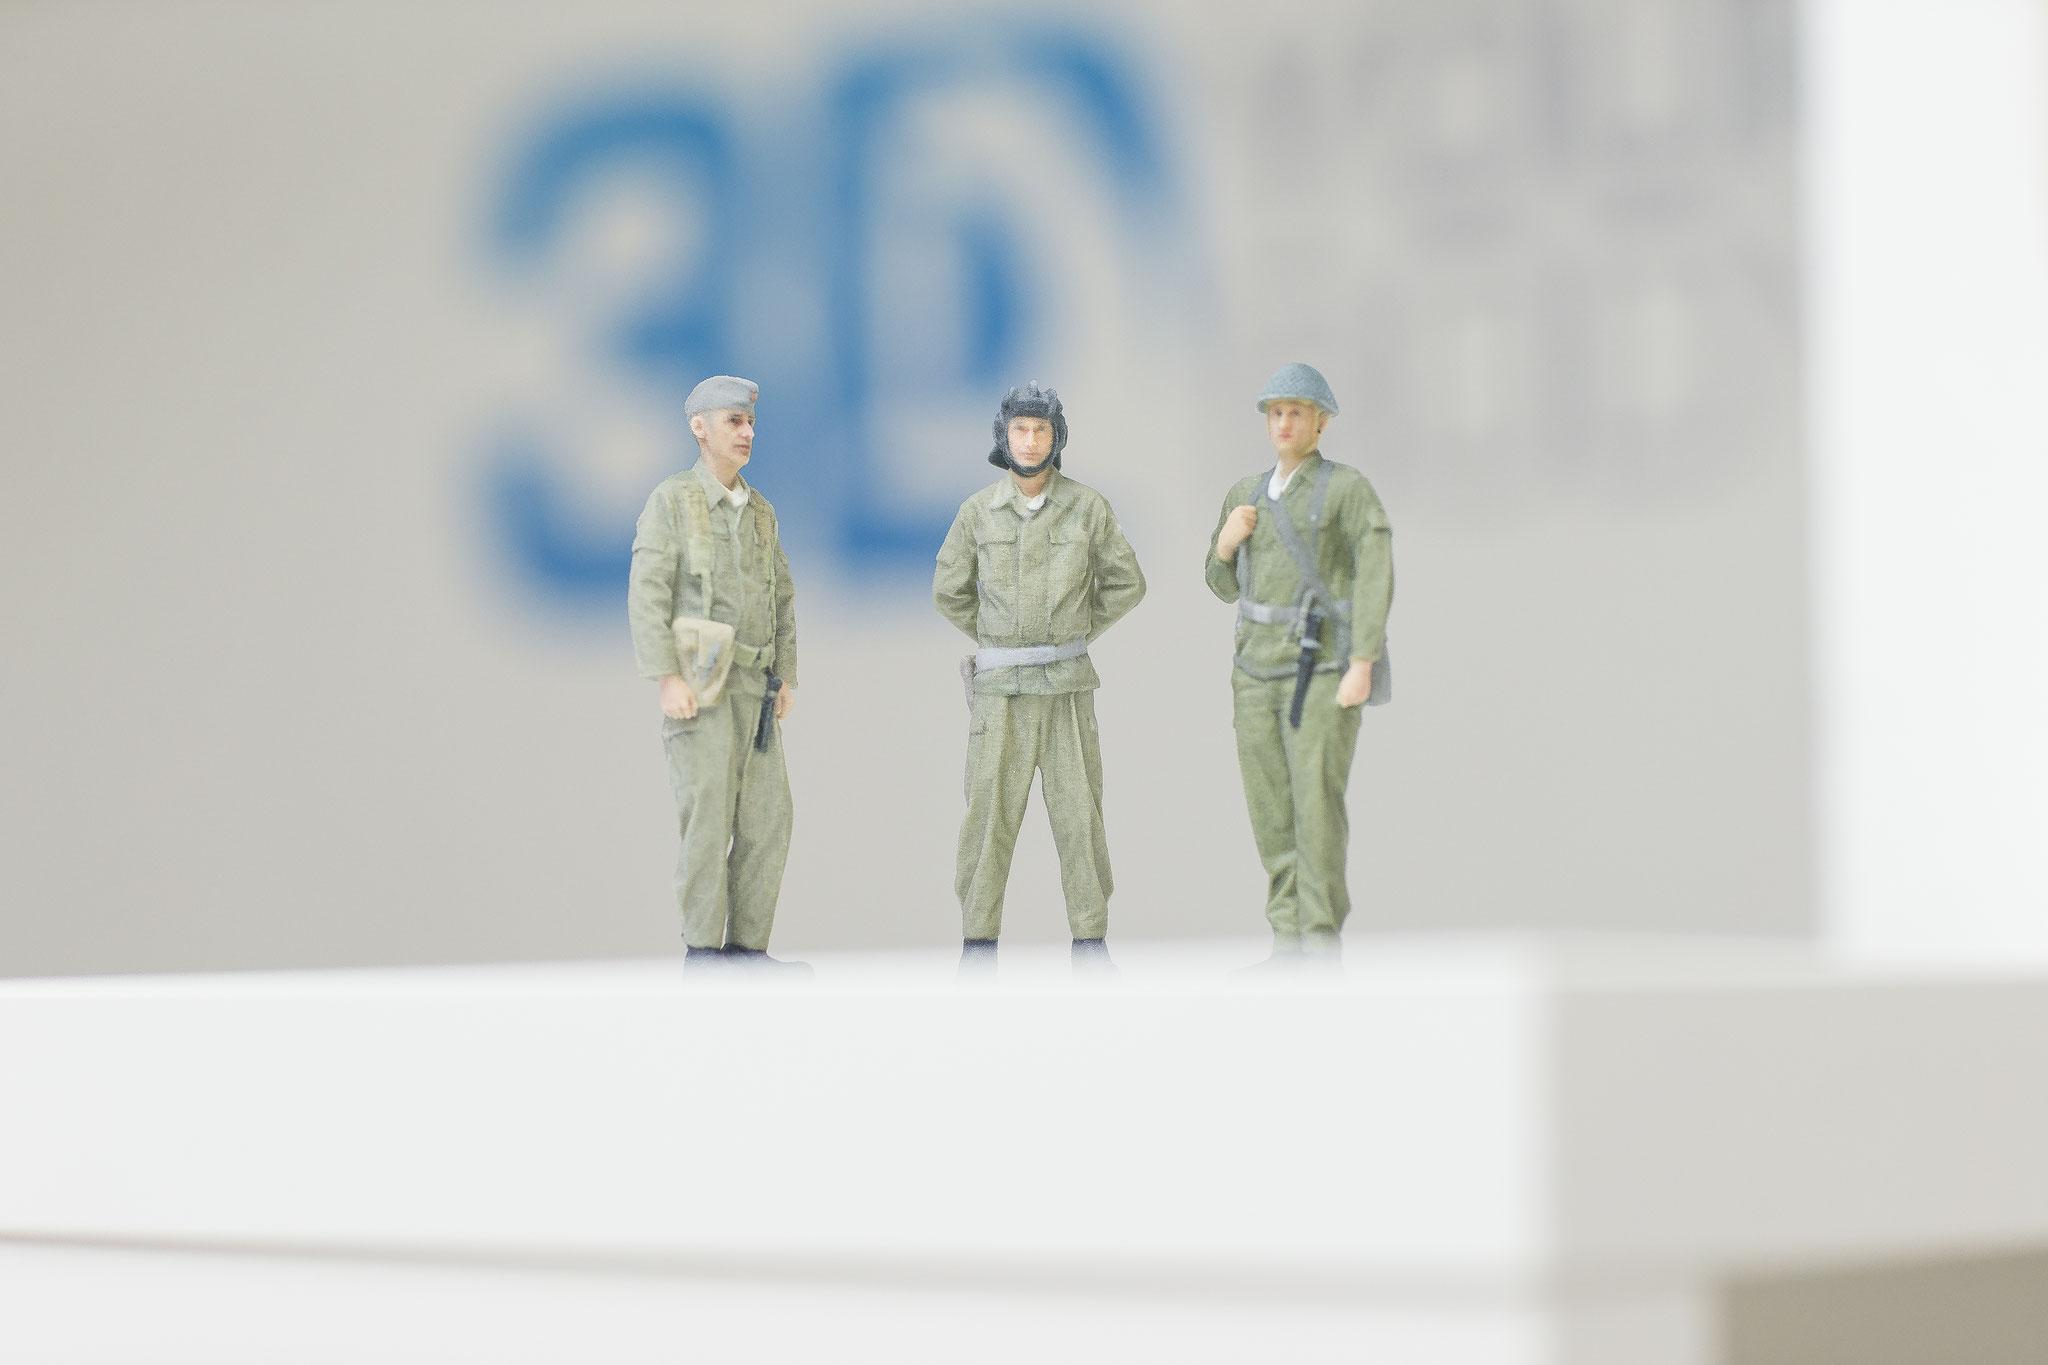 3D-Miniaturen aus Berlin, München, Köln, Rostock und Dresden